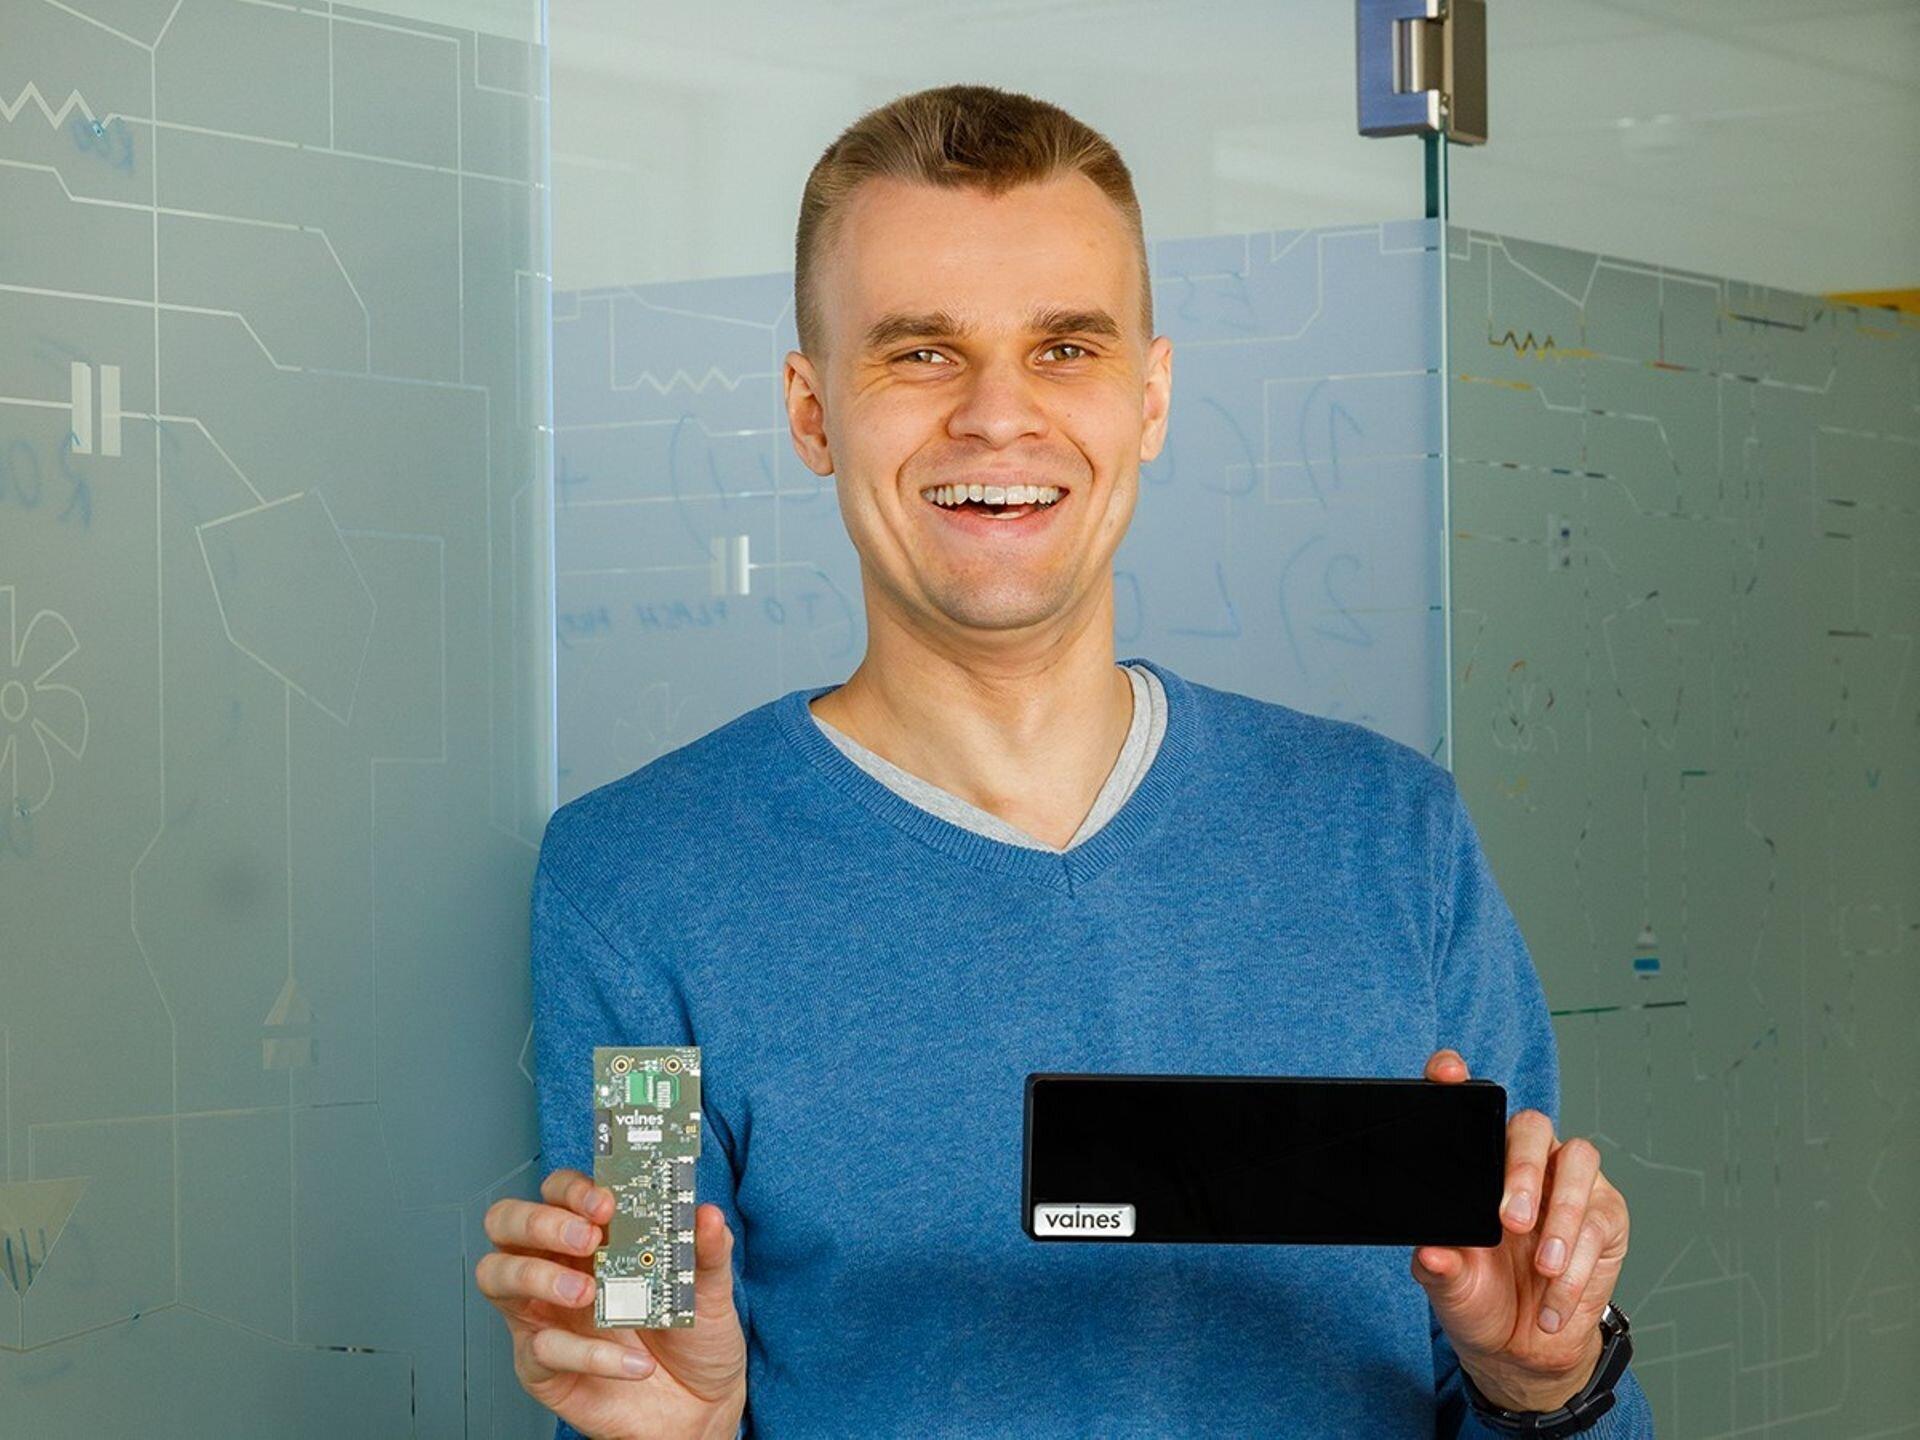 Jaan Hendrik Murmets showing off the hardware inside the Valnes smart lock.